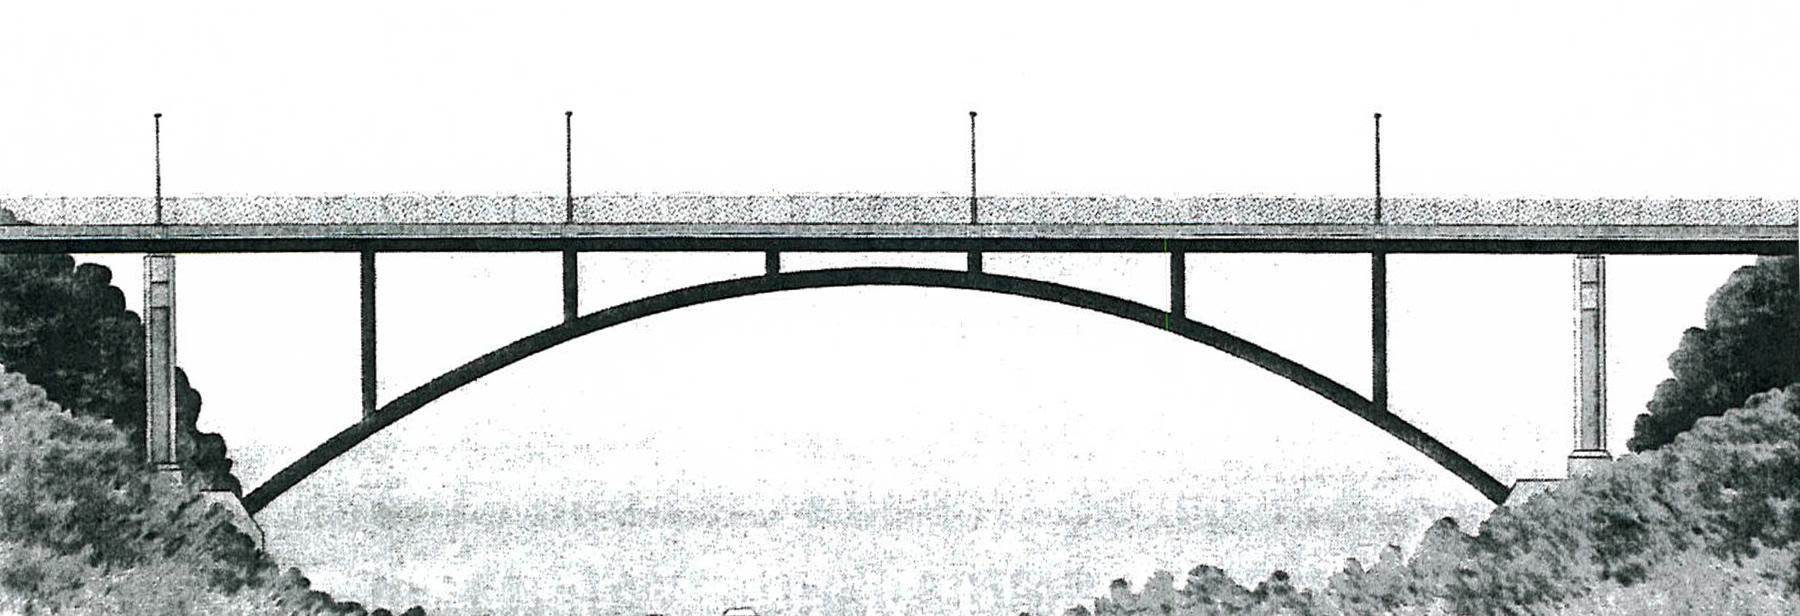 High Resolution Wallpaper | Bridge 1800x616 px